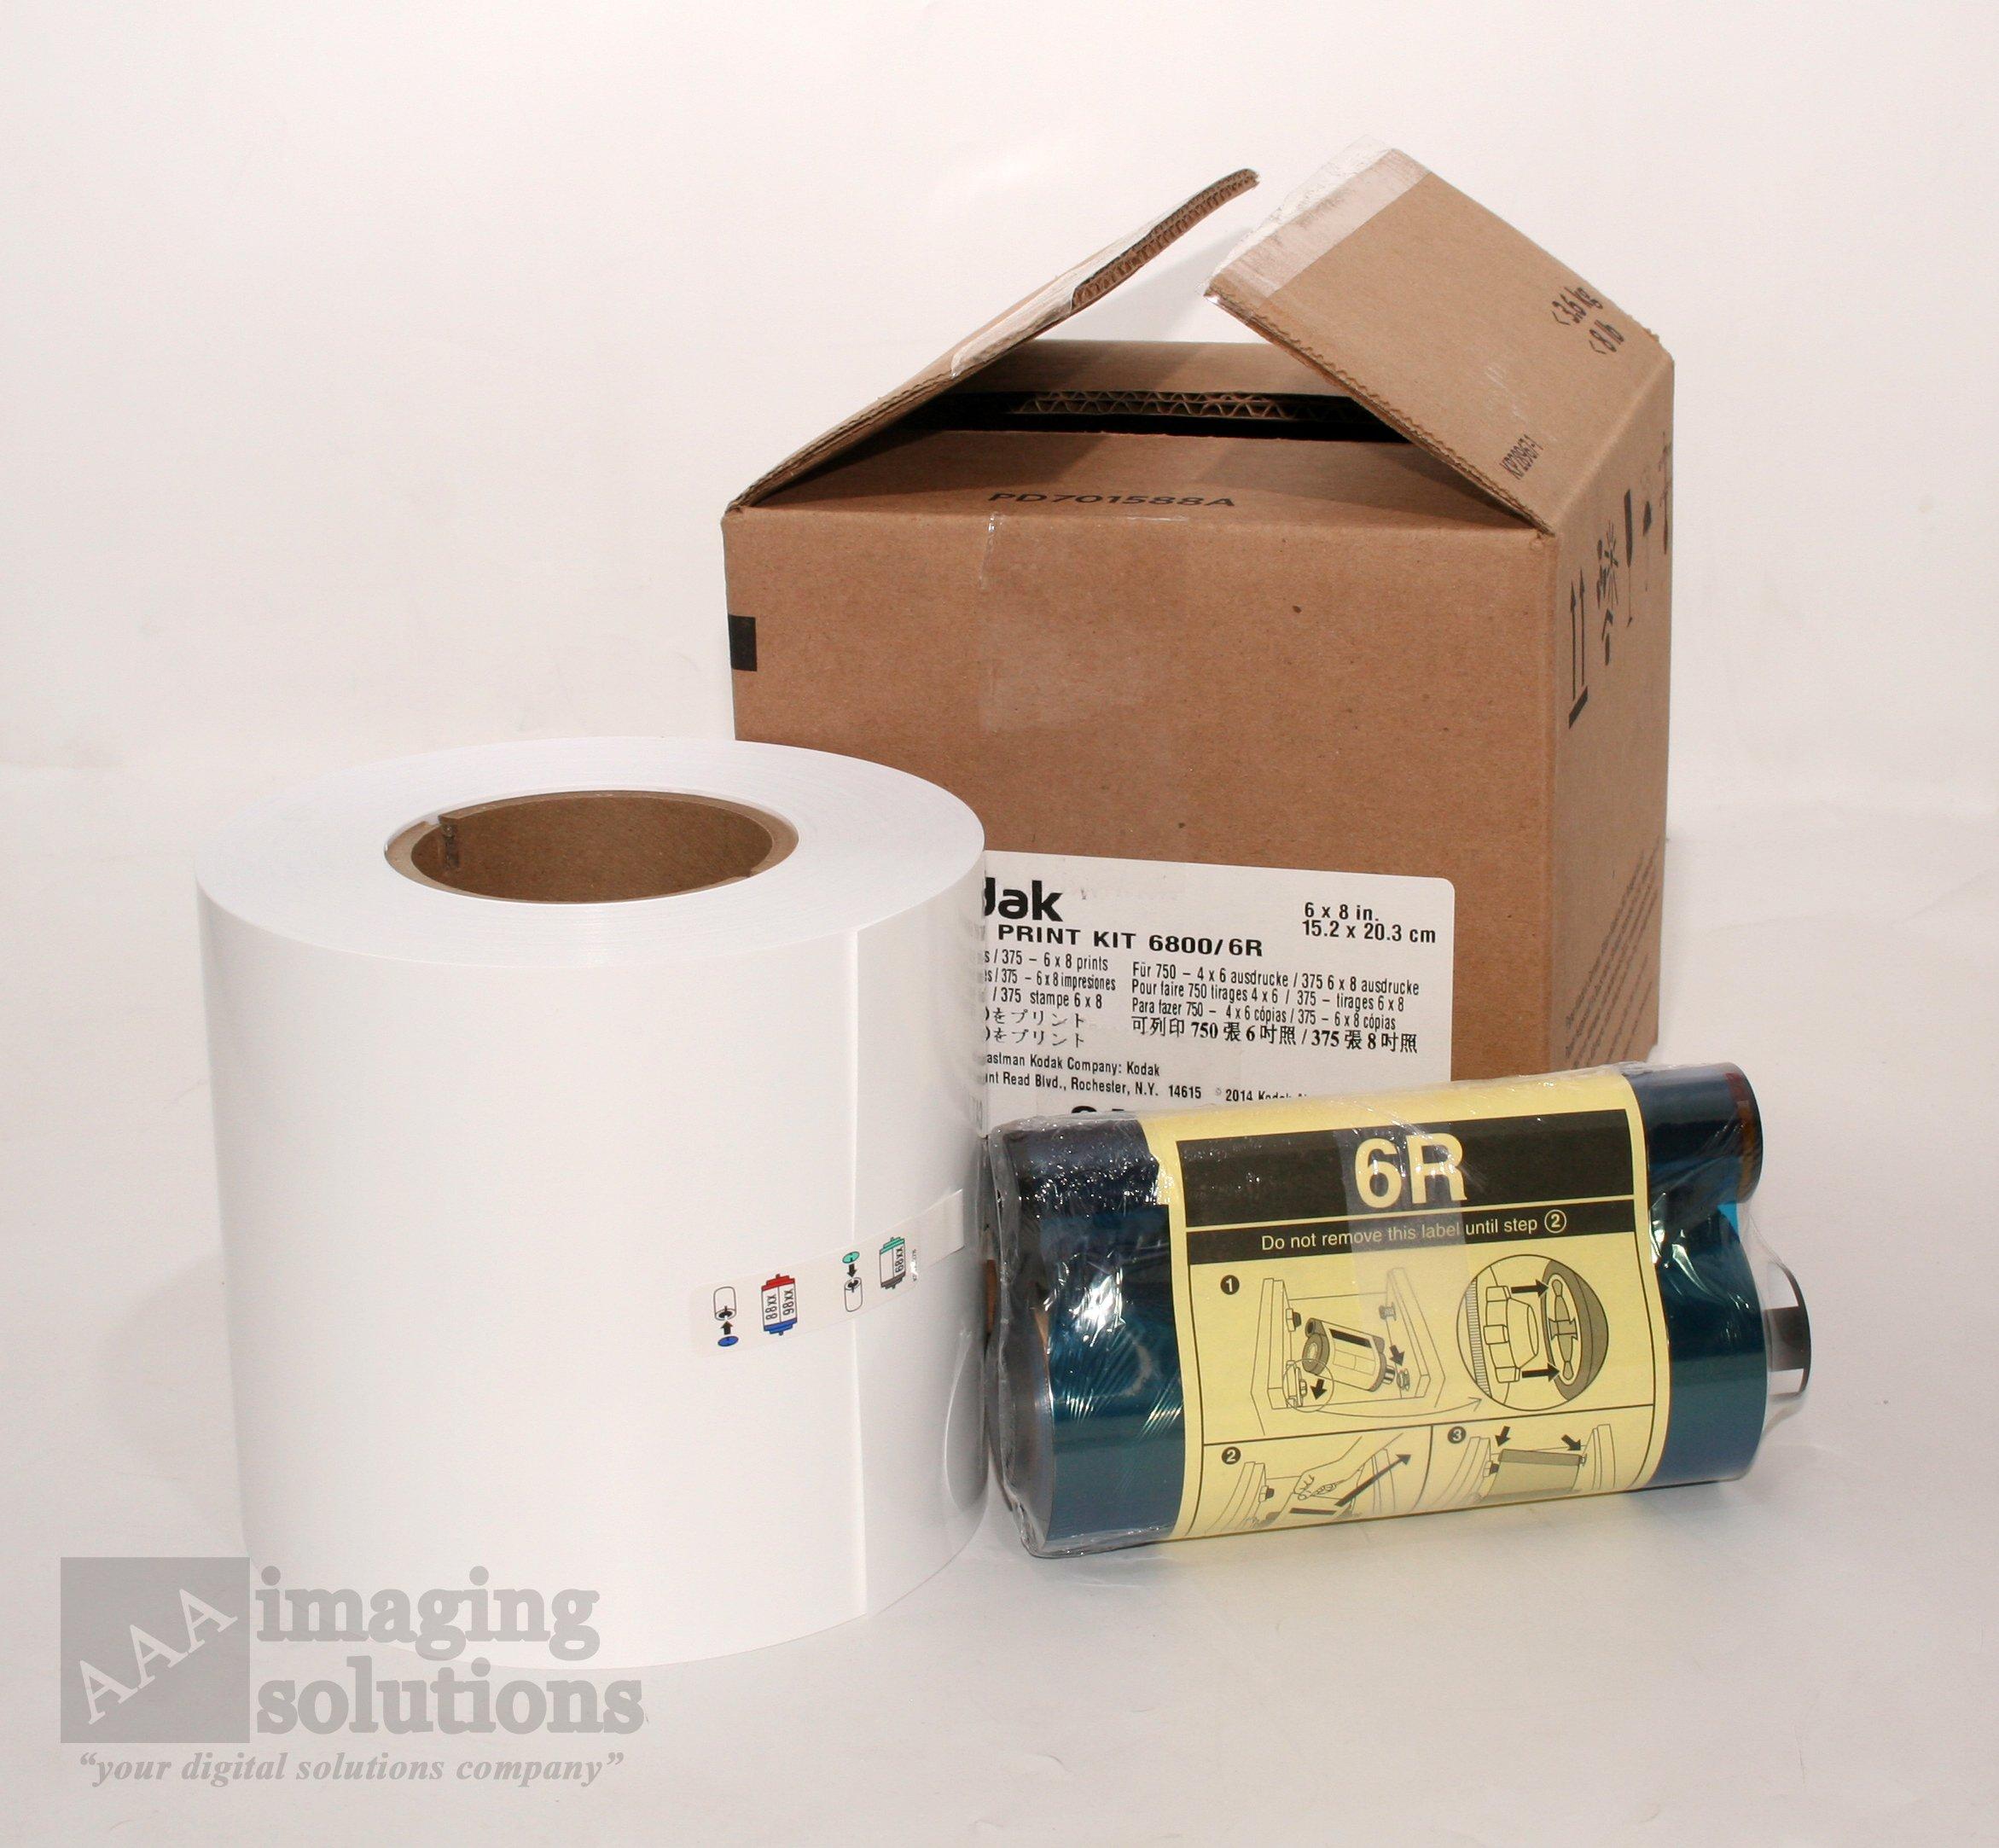 Kodak Photo Print Kit for the 6800 Thermal Printer, 6R - Ribbon & Paper for 375 6'' x 8'' Glossy Prints